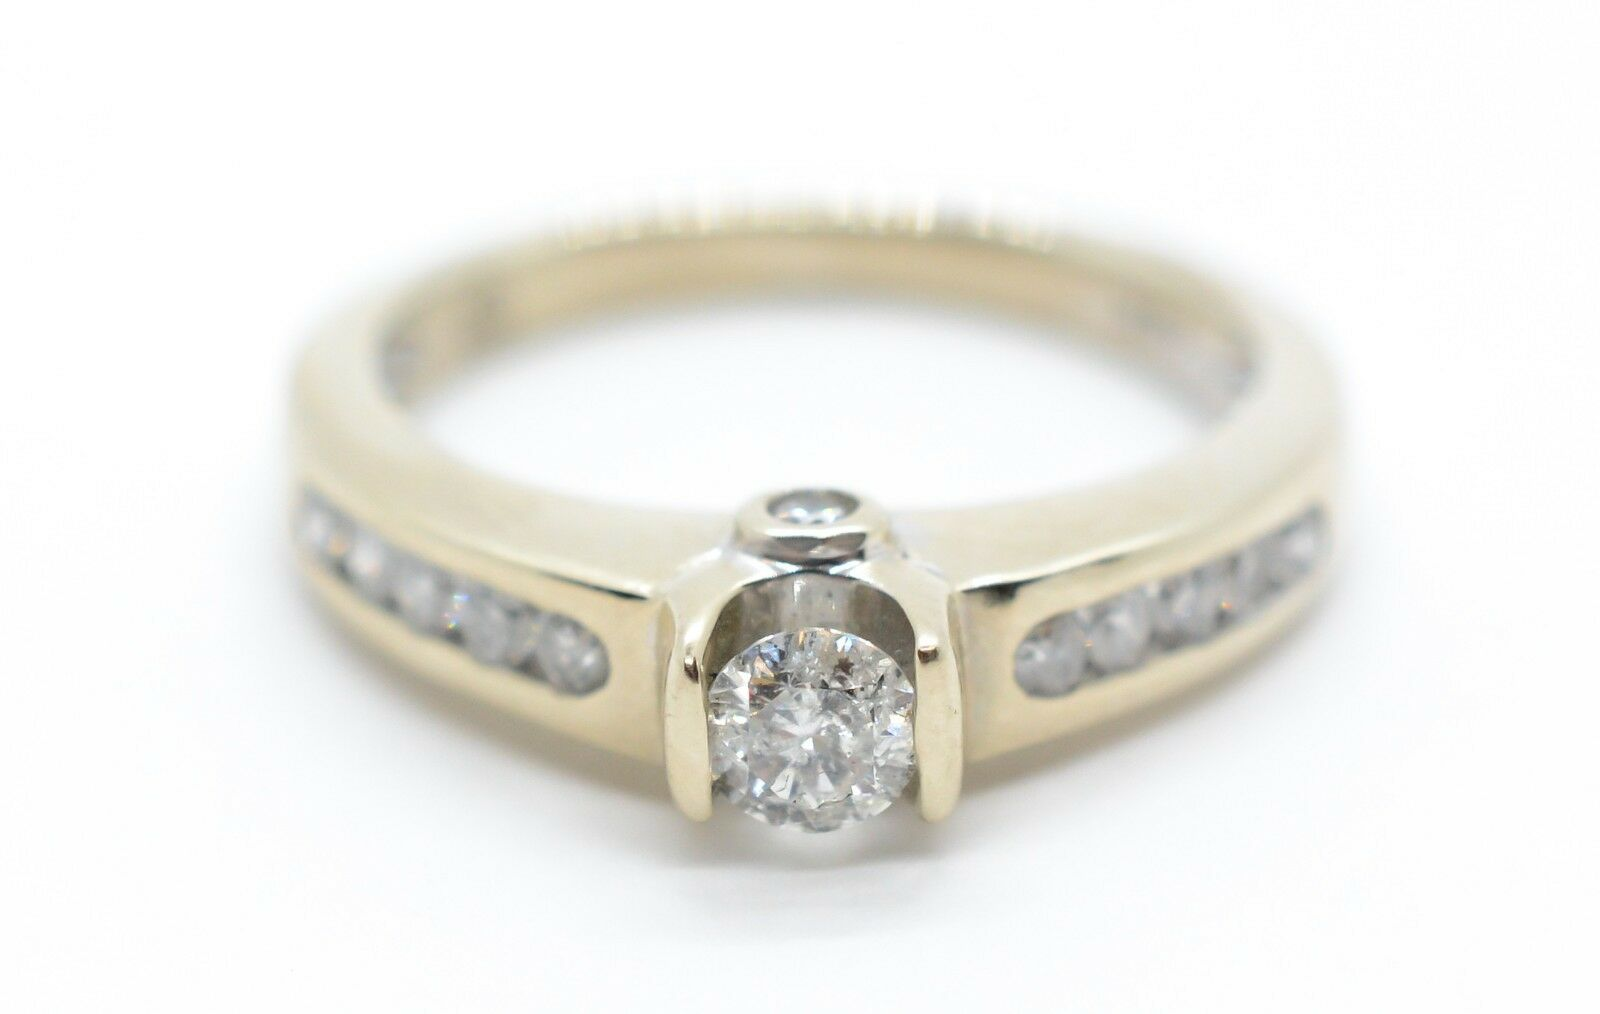 Diamanten Echtschmuck Trauringe Eheringe Aus 585 Gold Bicolor Mit Diamant & Gratis Gravur A19013495